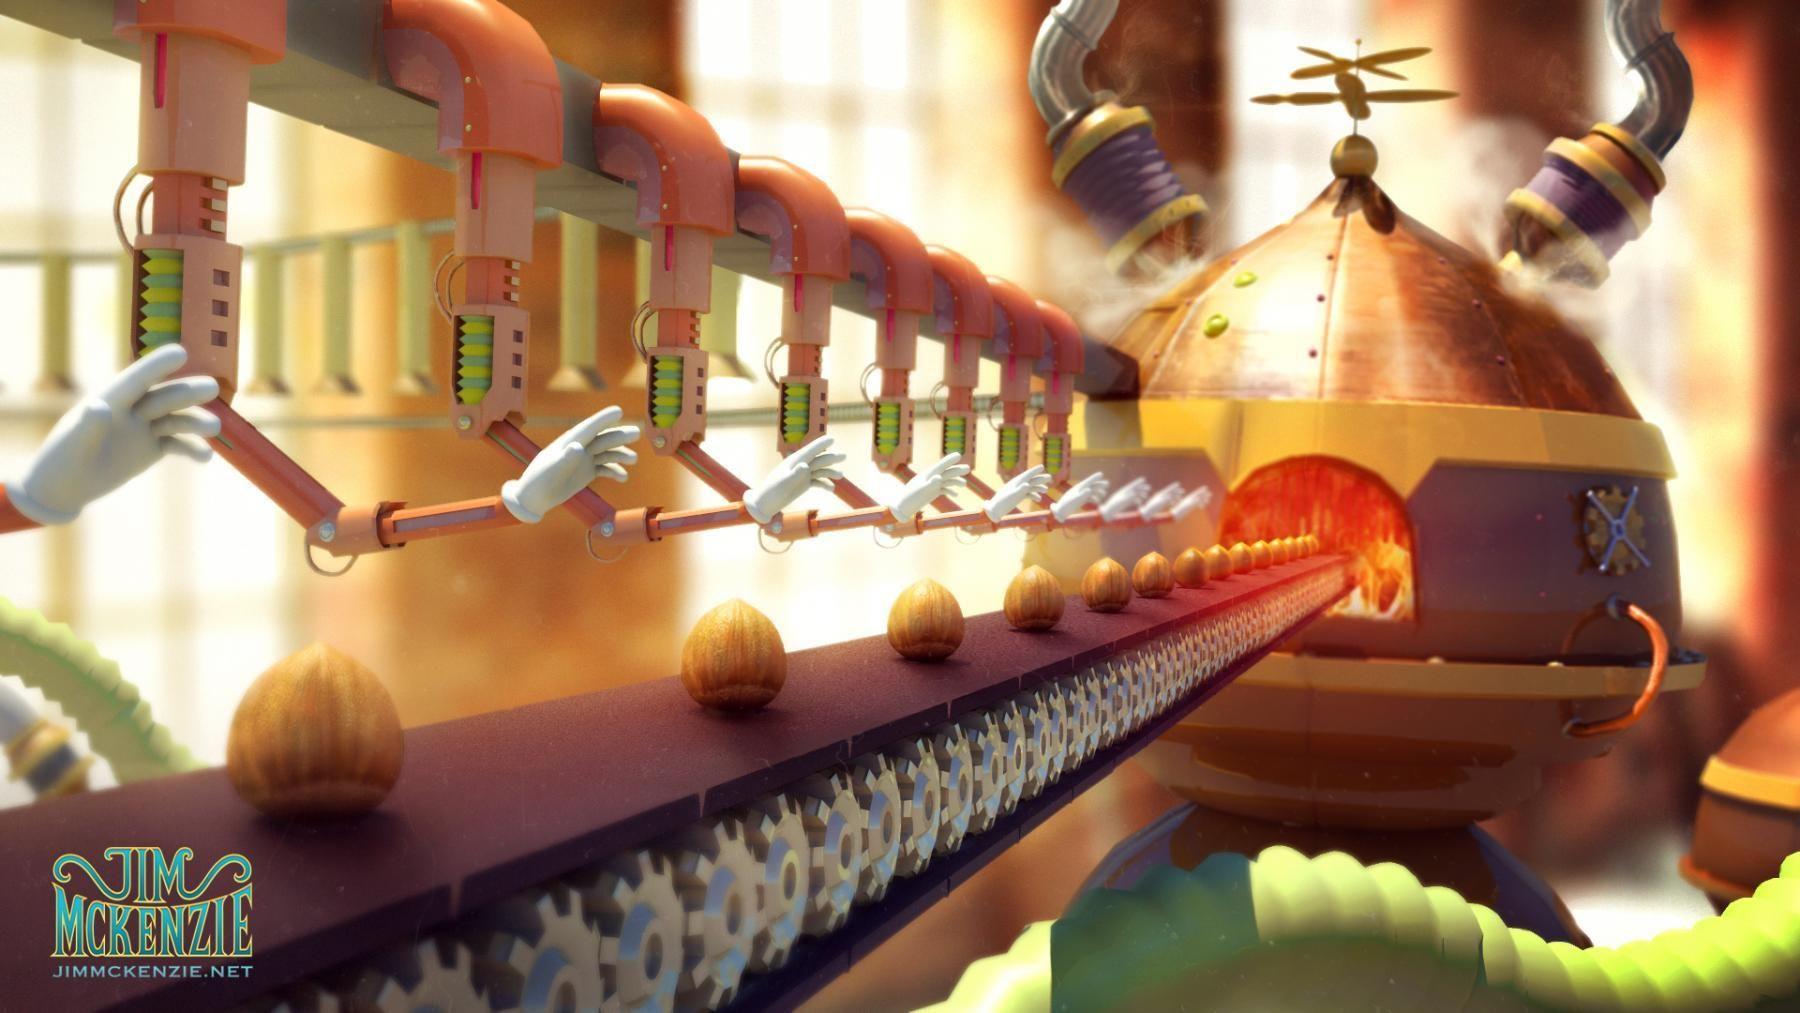 Chocolate Factory Concept Art / 3D Model   Visual art   Pinterest ...